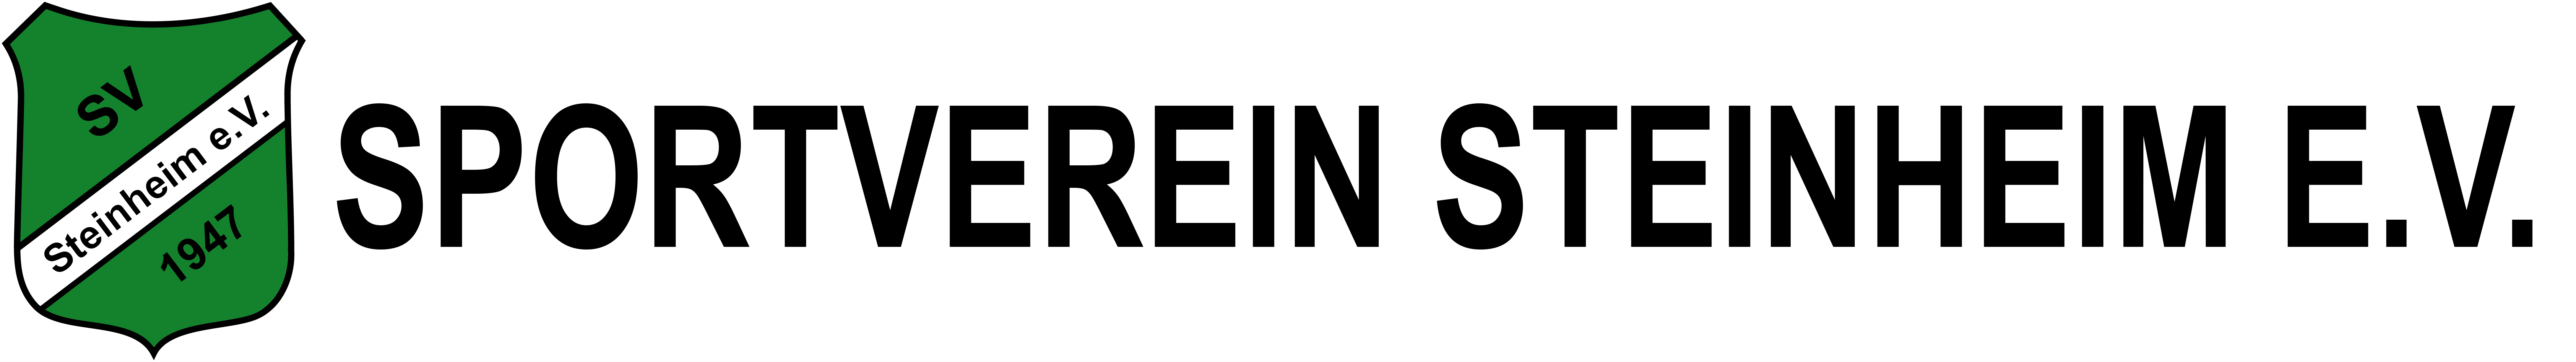 Breitensport – SV Steinheim e.V.